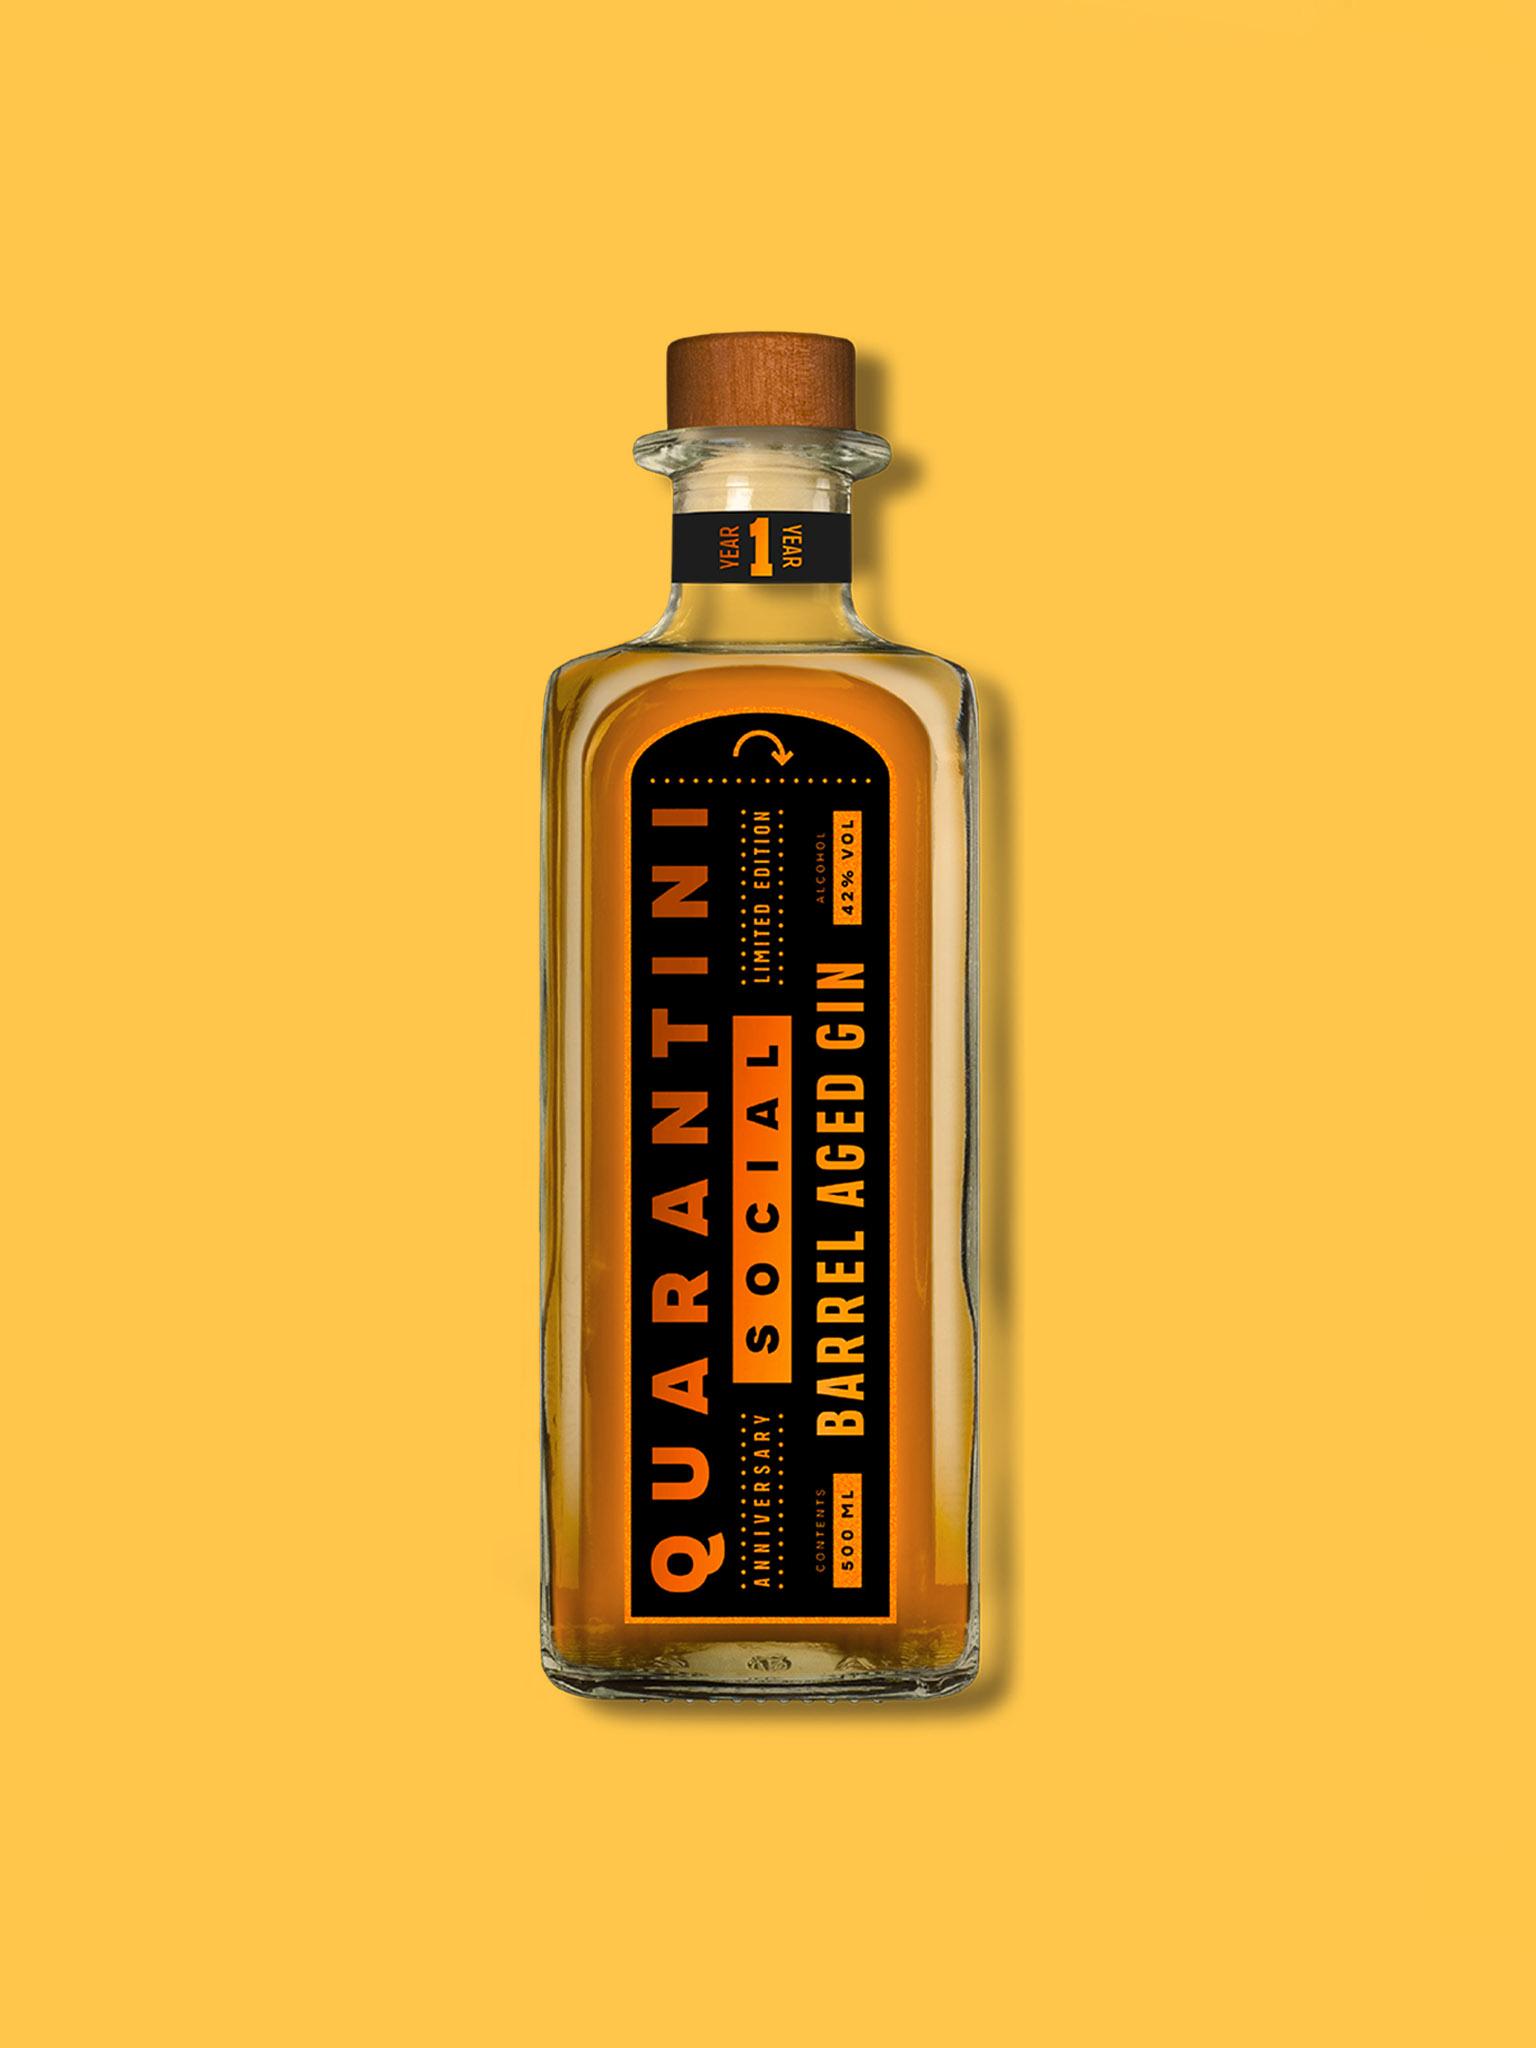 Quarantini Barrel Aged Gin